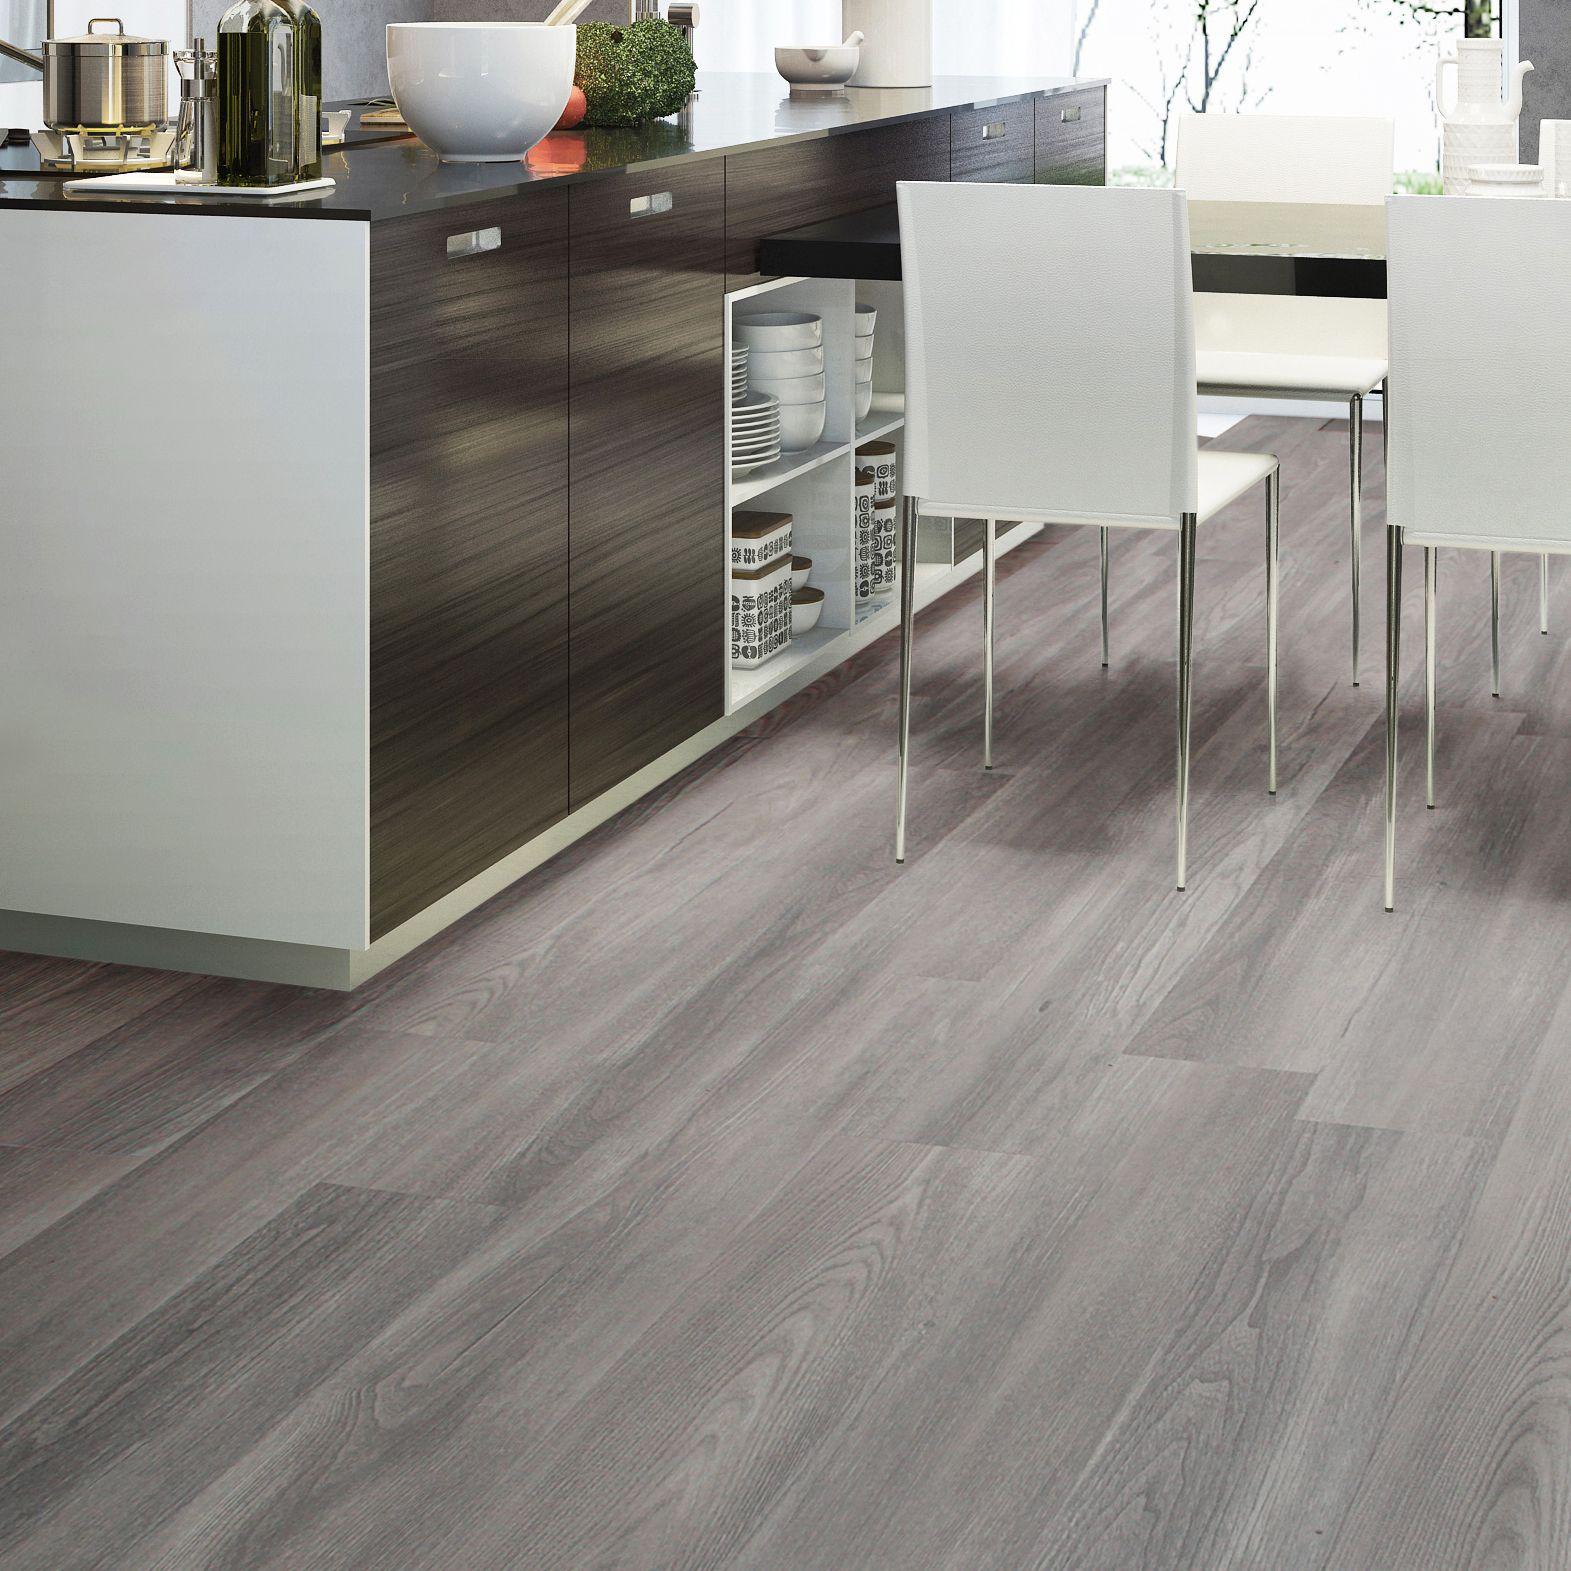 Grey Natural Oak Effect Waterproof